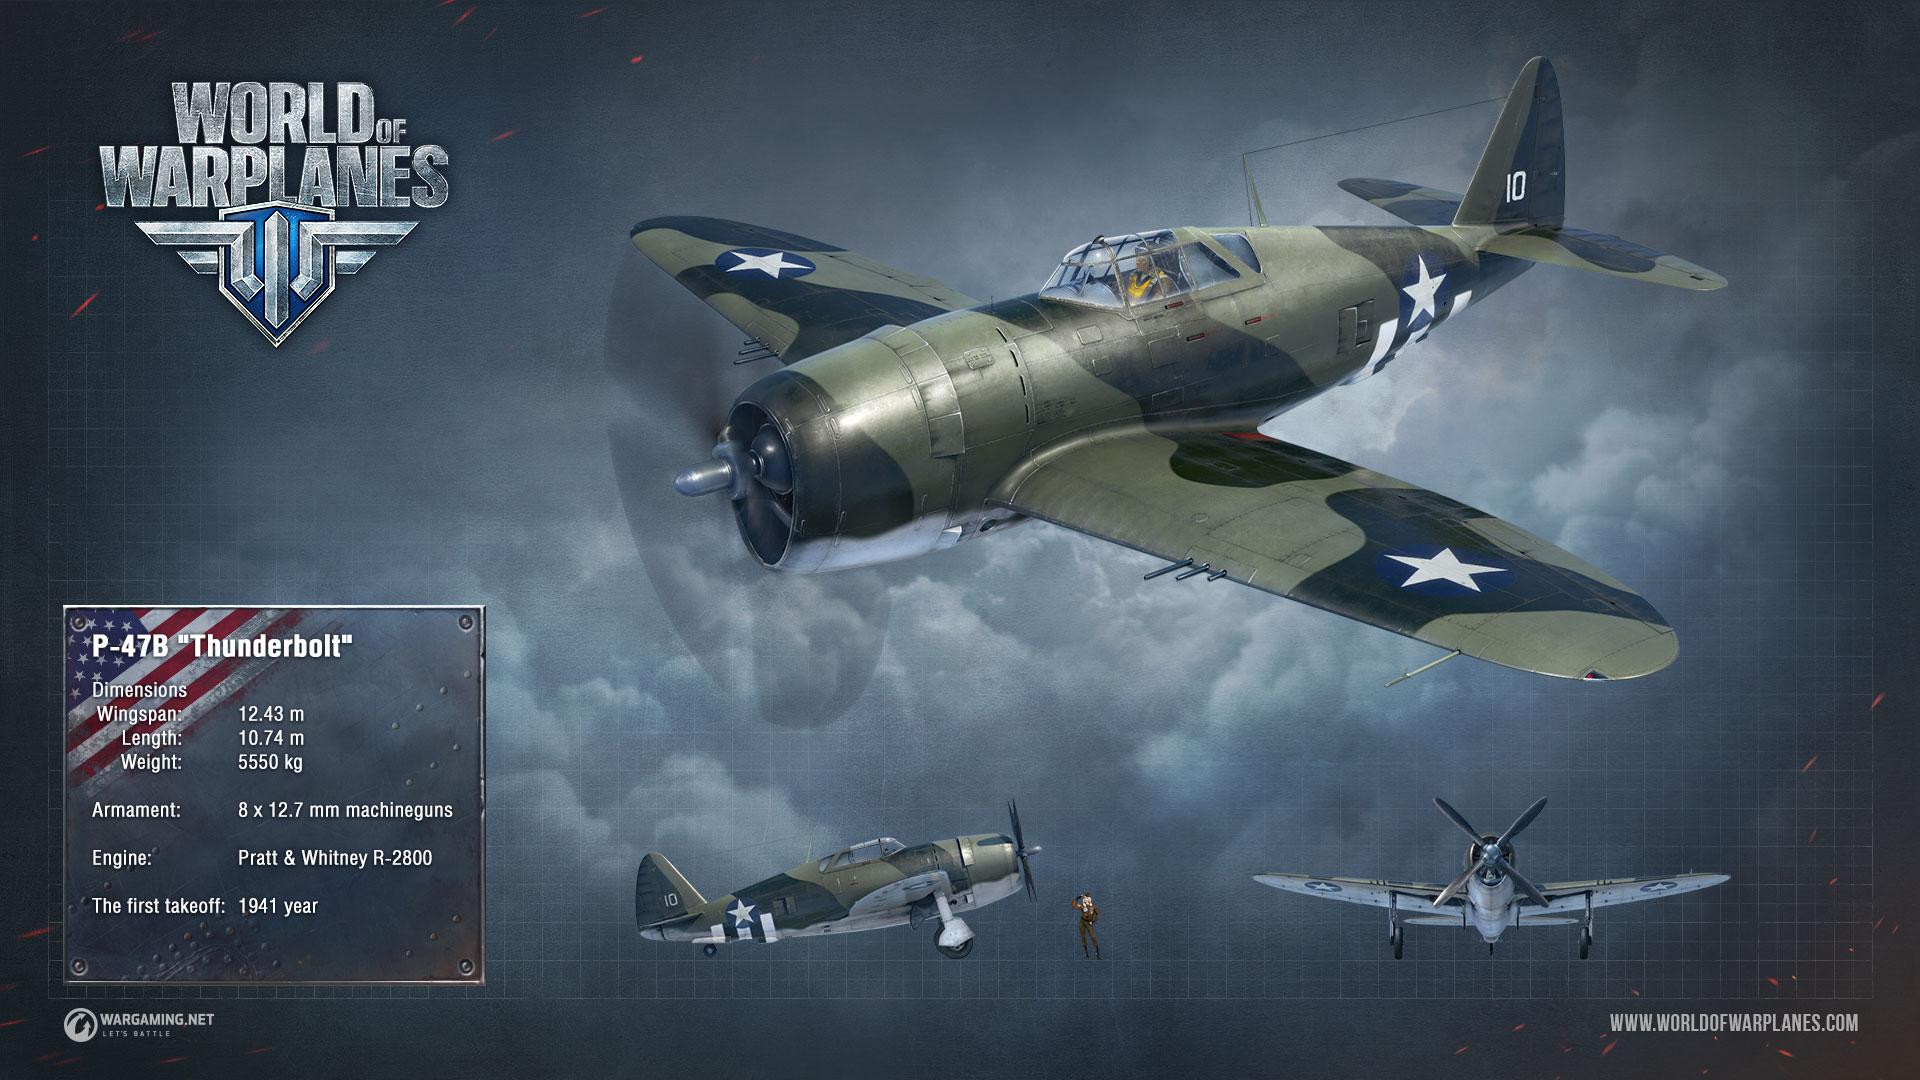 Steam Card Exchange Showcase World Of Warplanes Big Boss Kunci Ring India 12 X 13 Mm 3 10artwork P 47 Thunderbolt